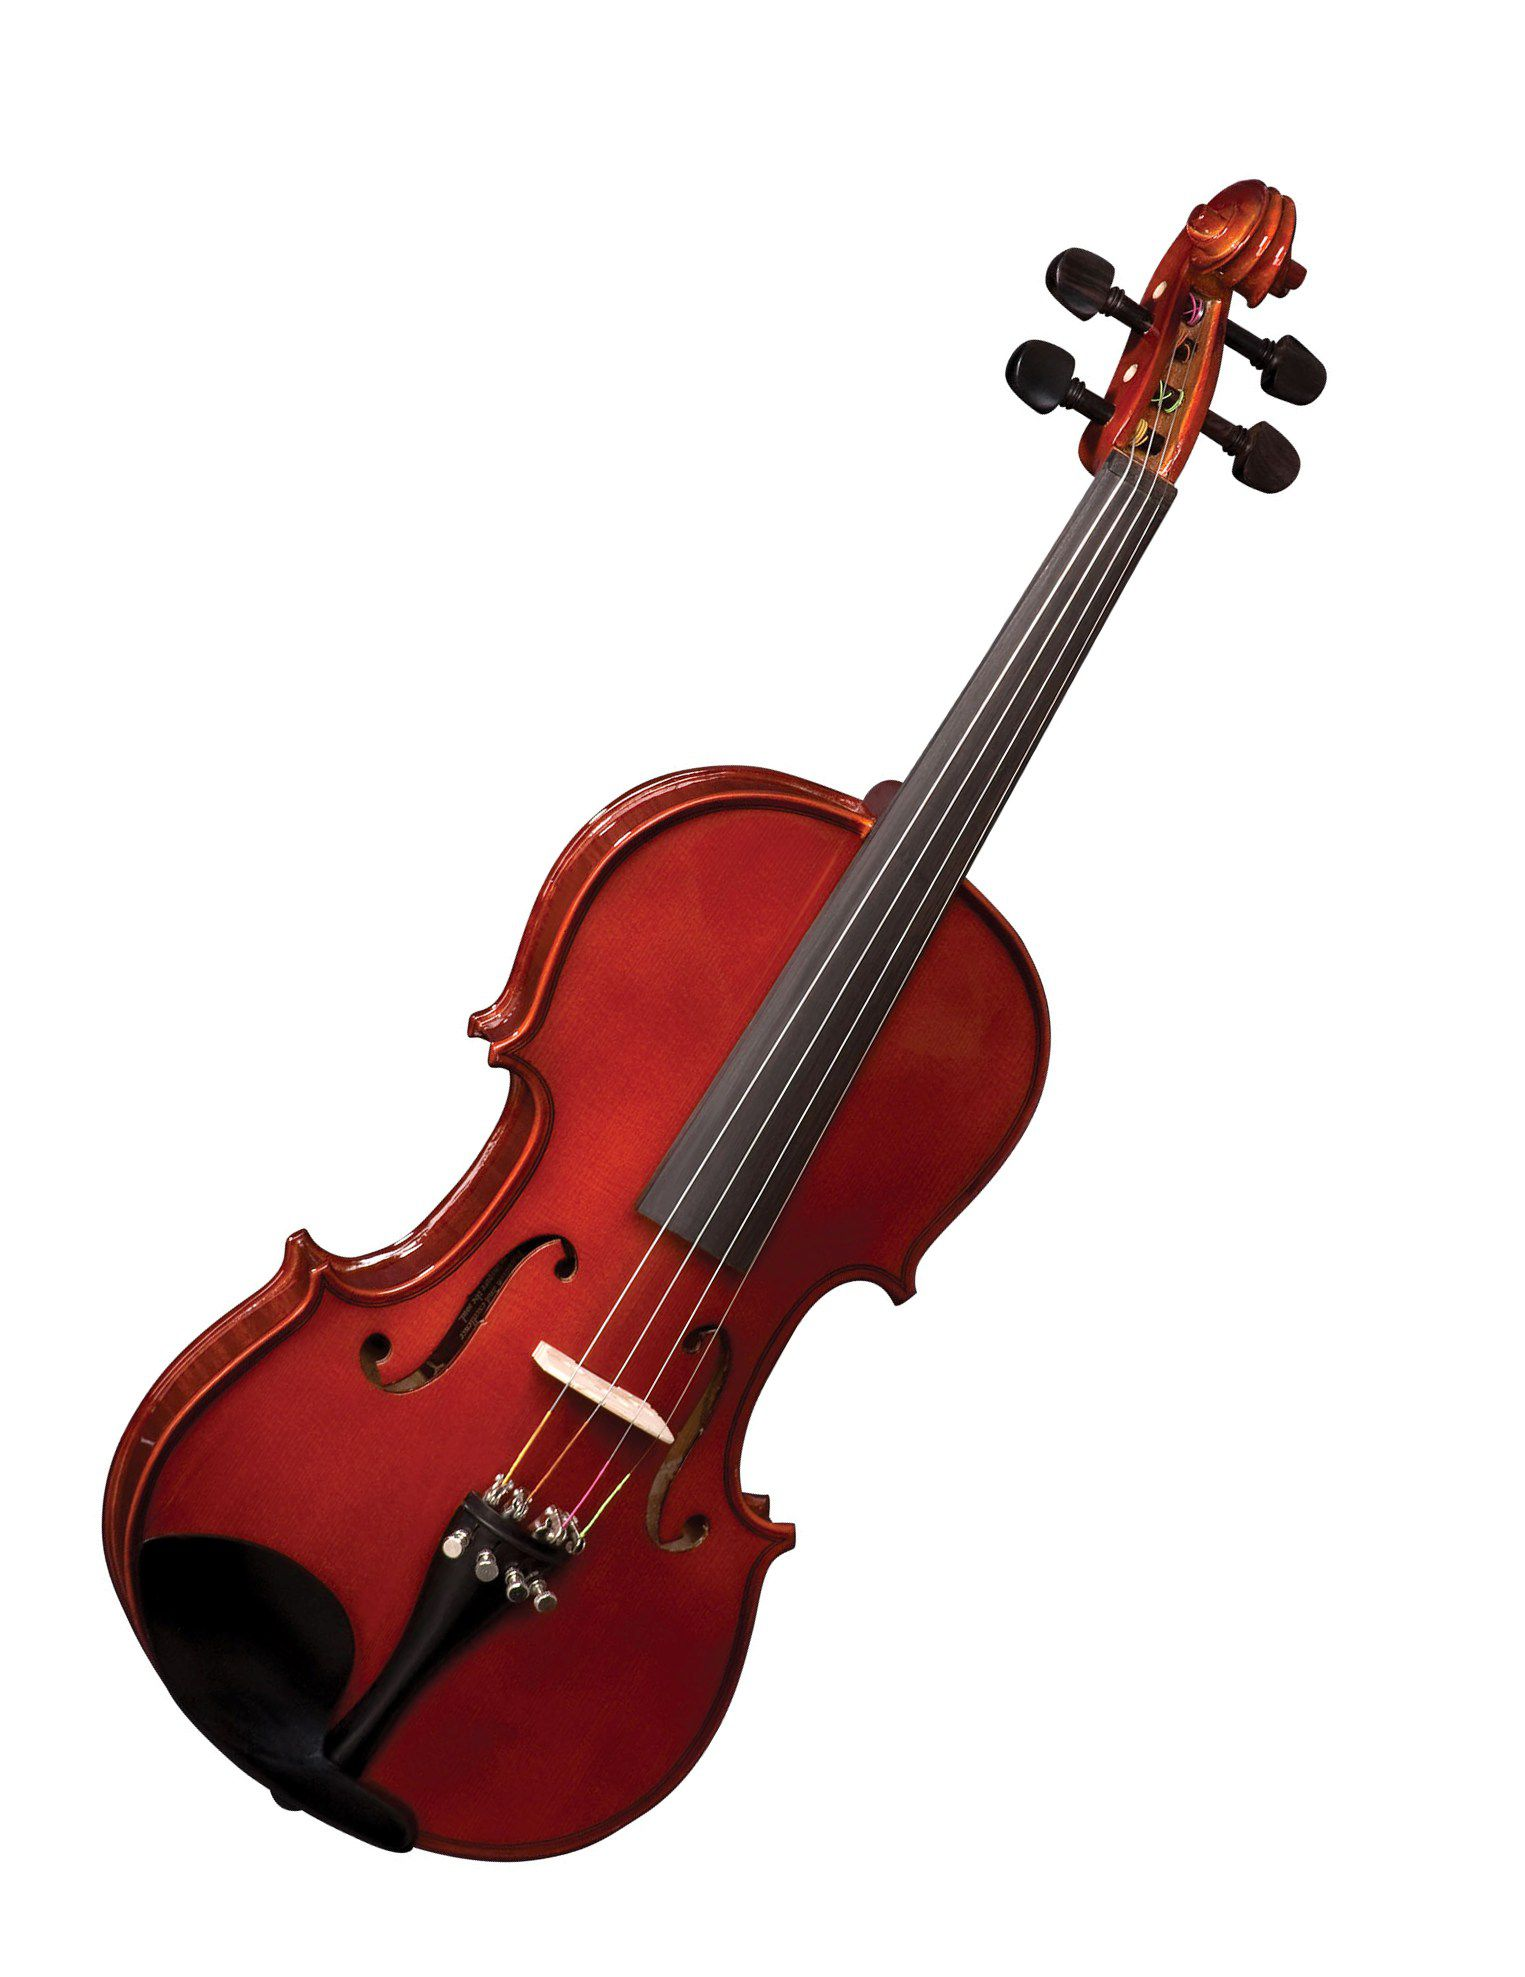 Violino Eagle Ve144 4/4 Rajado Semi Profissional Completo